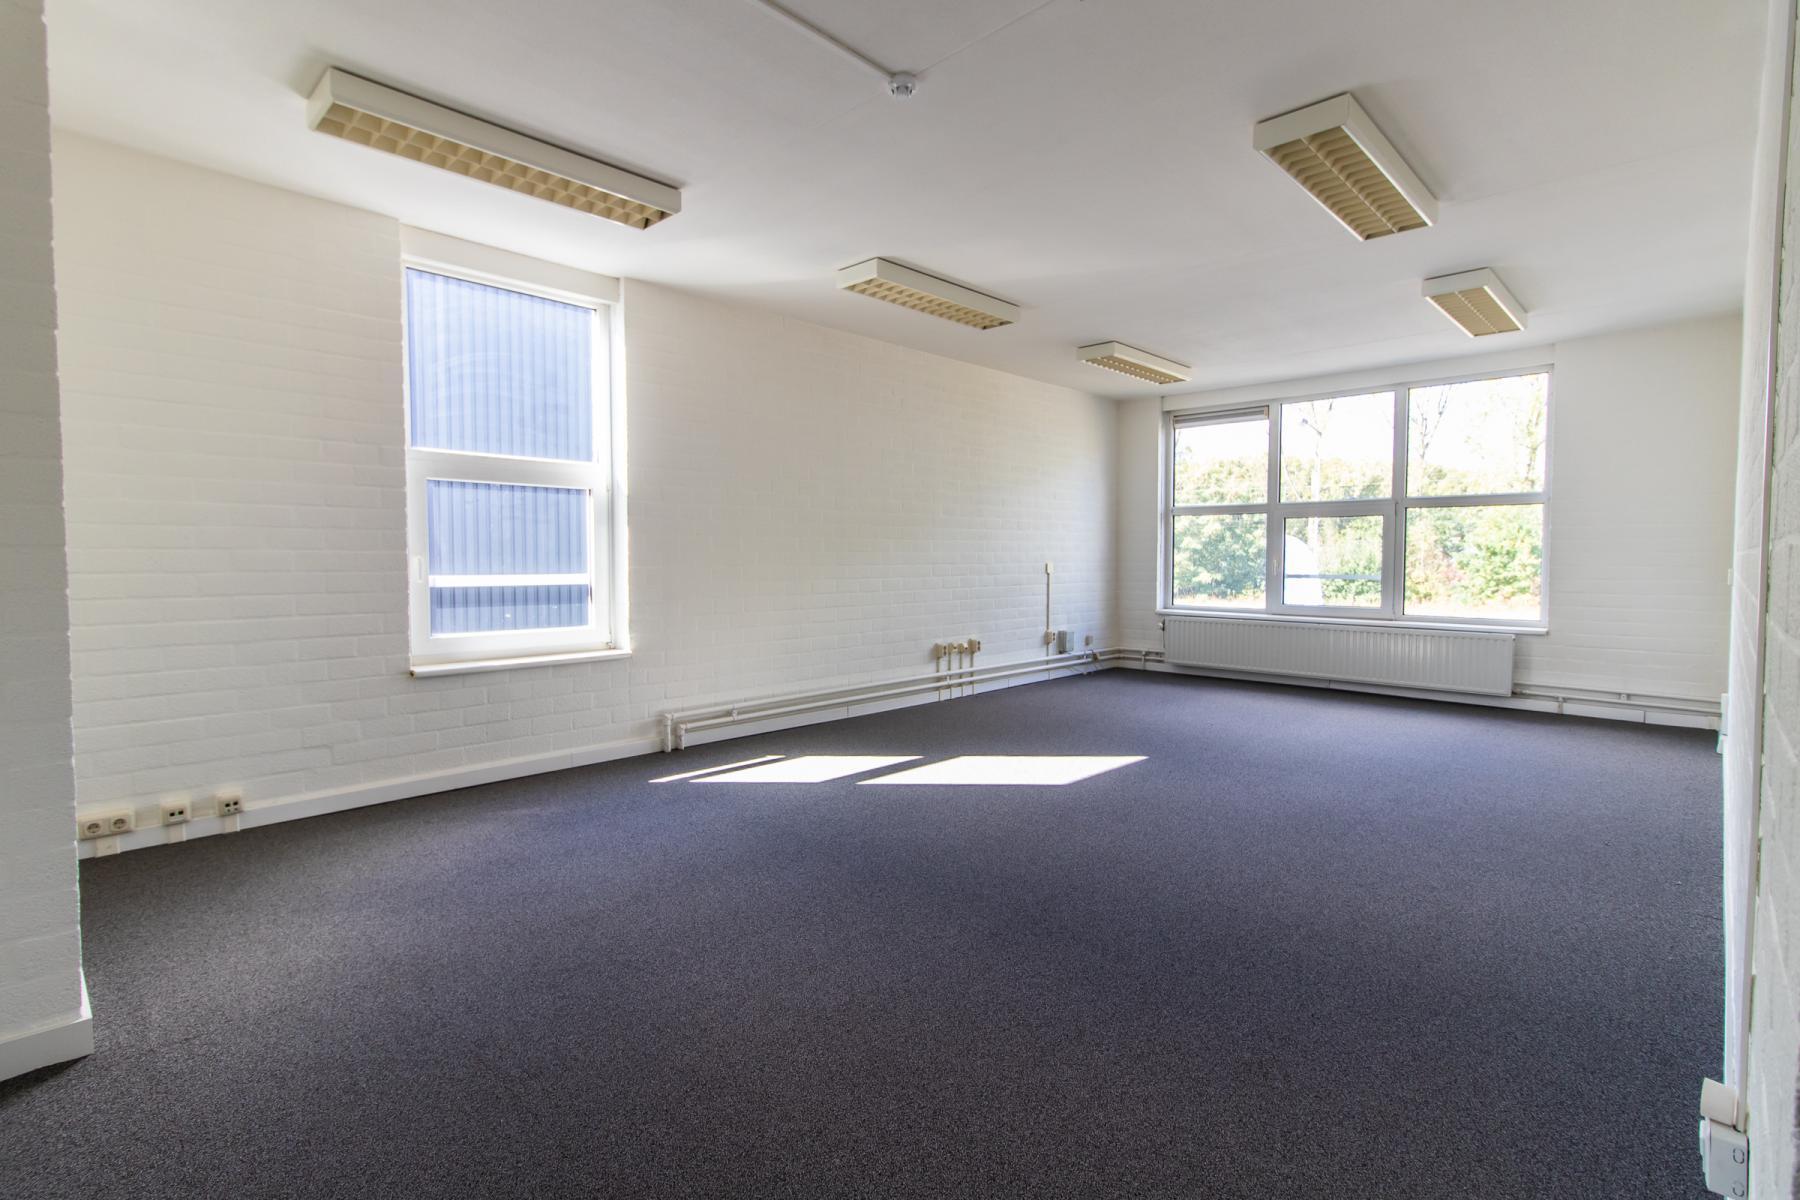 Rent office space Middelweg 25, Beek Lb (10)